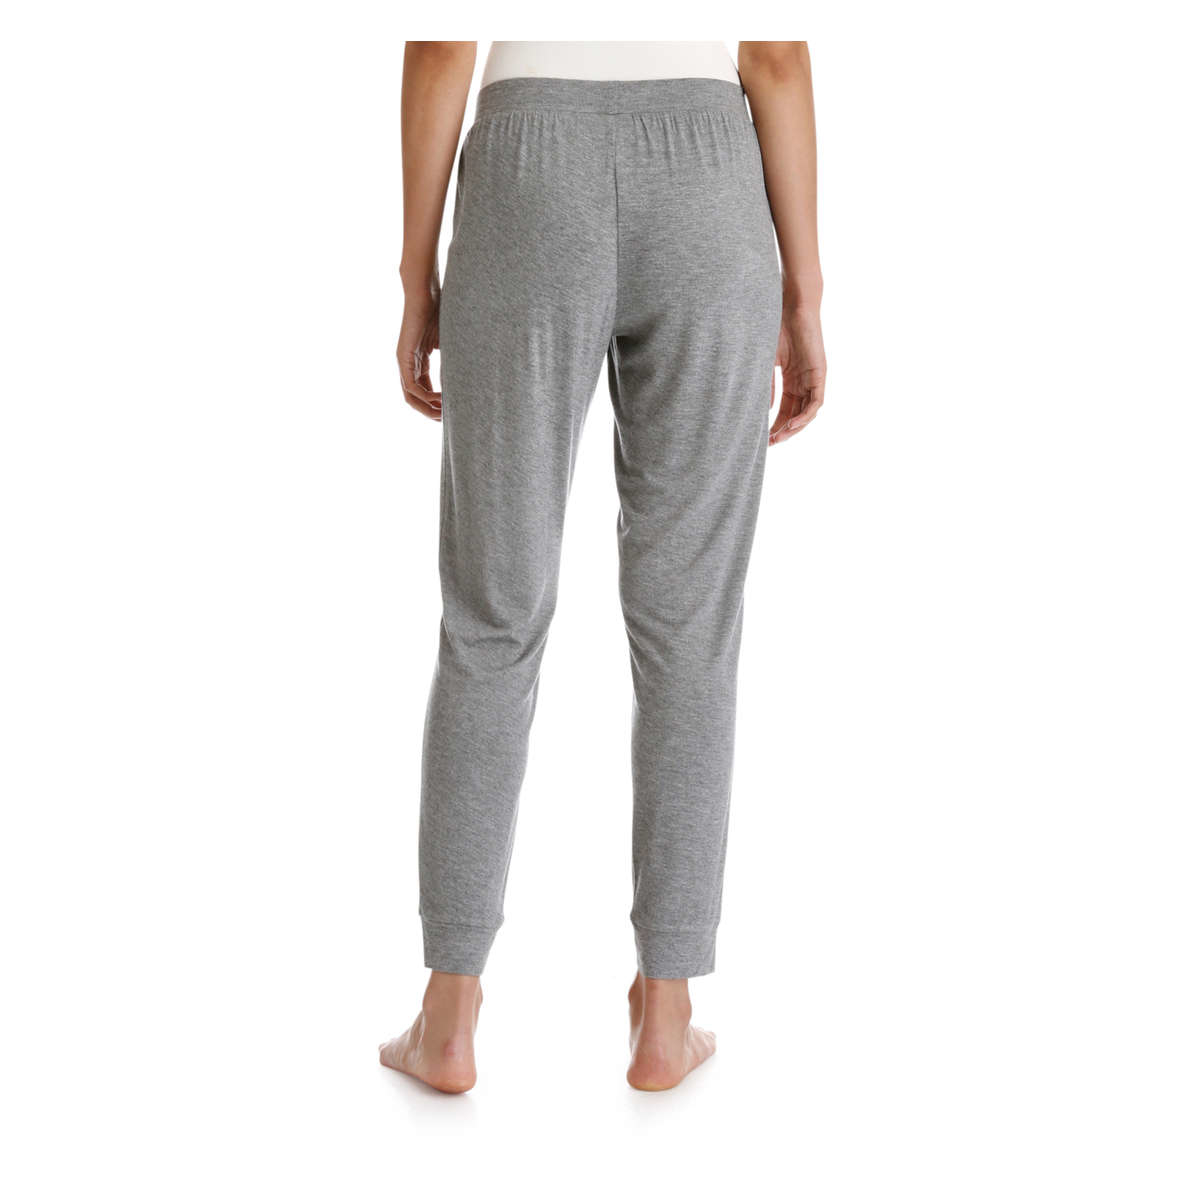 4bd2fa4a5c Lyst - Joe Fresh Lounge Track Pant in Gray